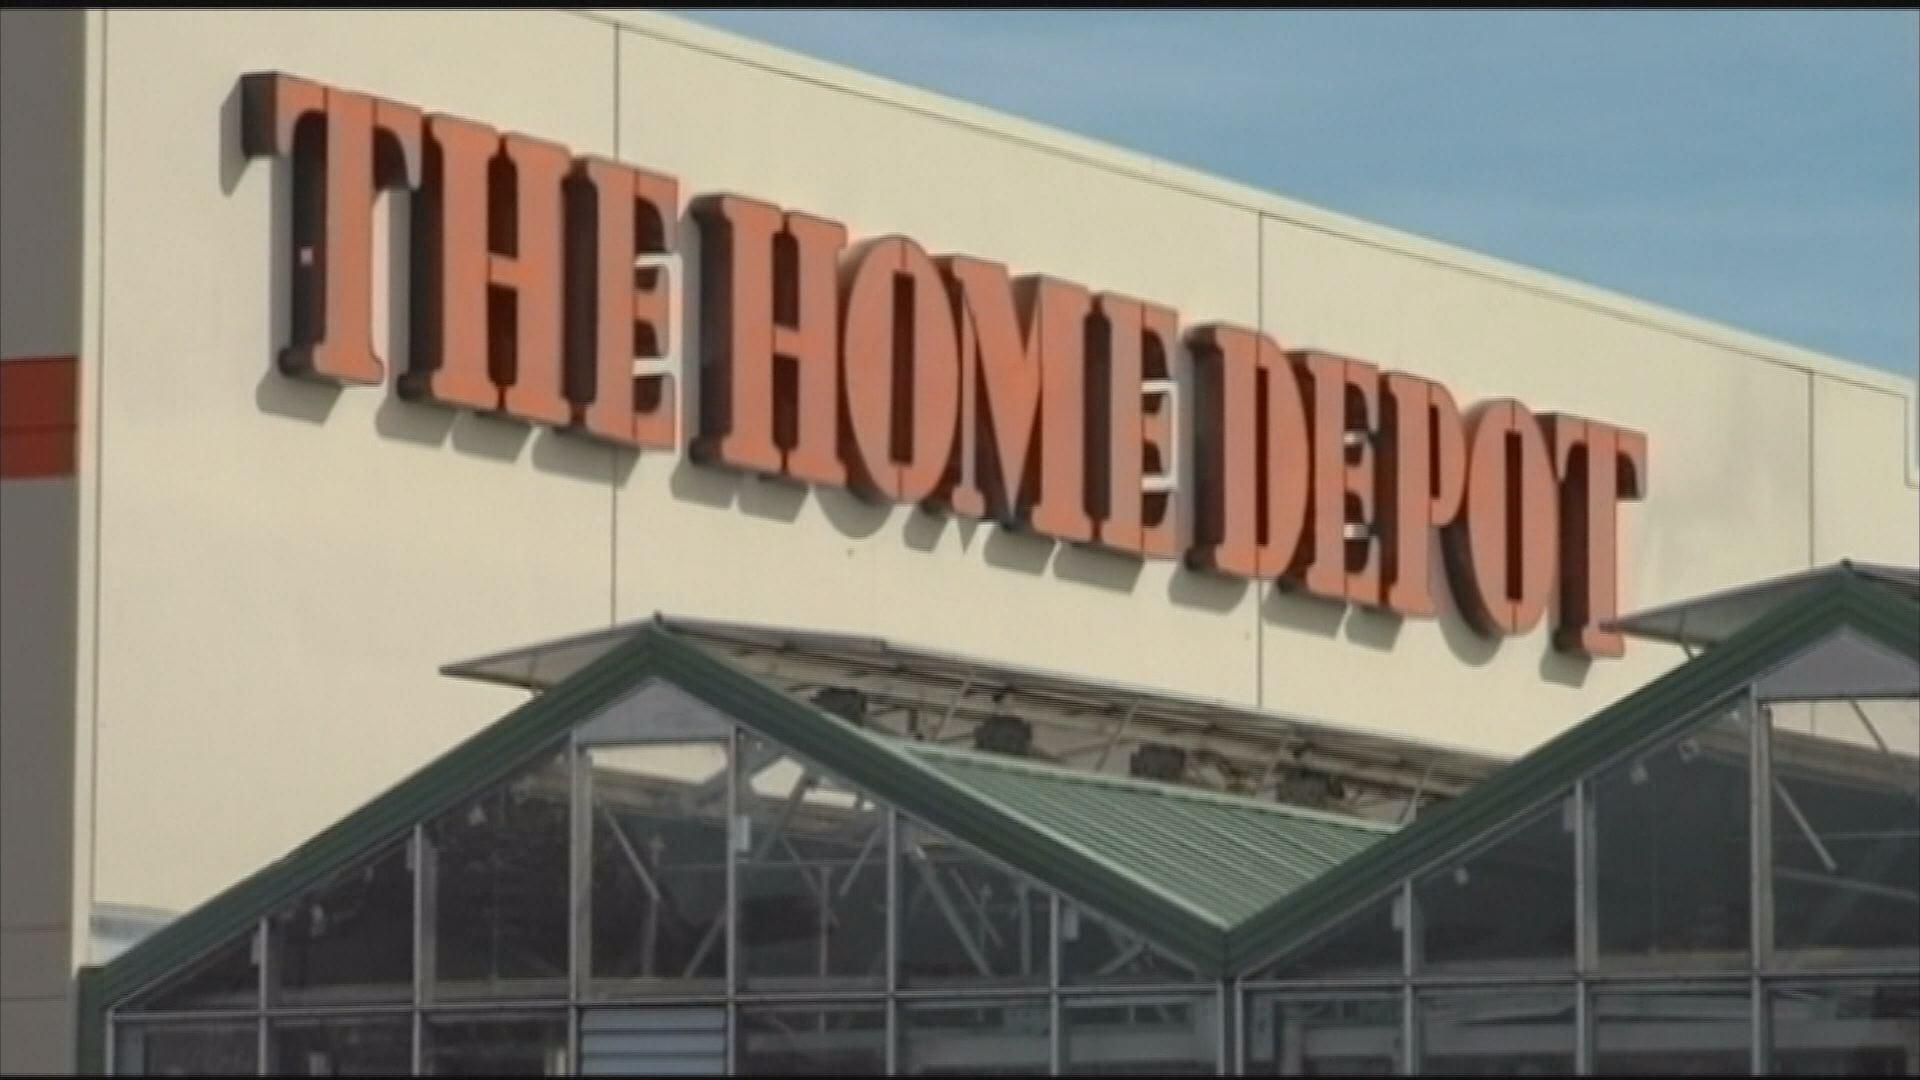 Home depot hiring over 300 new associates in buffalo for Depot hamburg